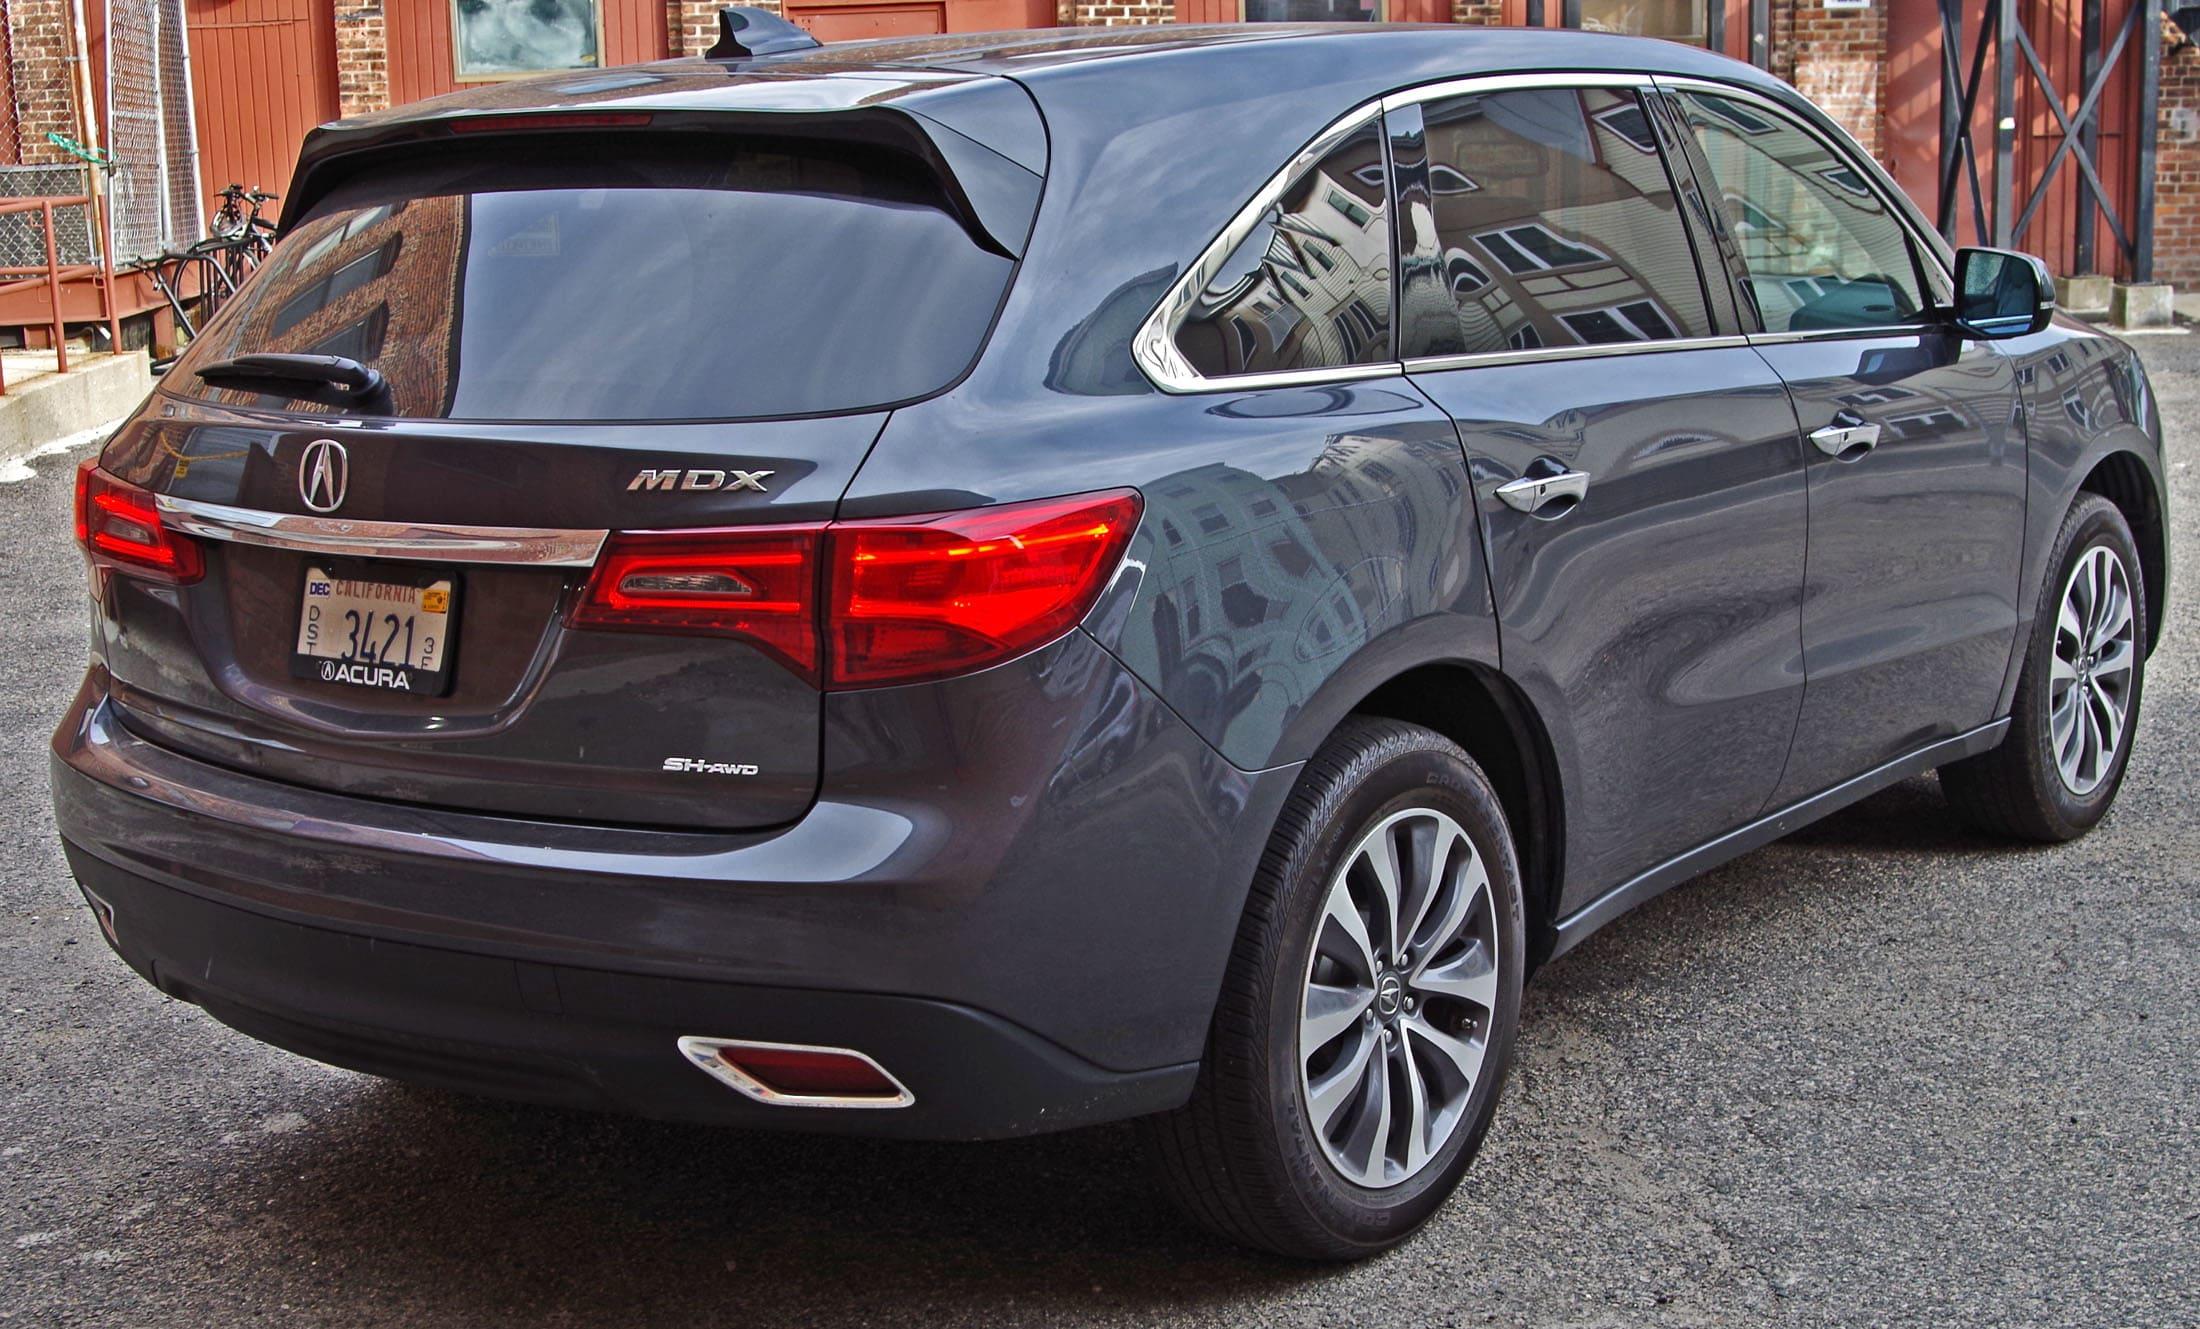 2014 Acura MDX rear view.